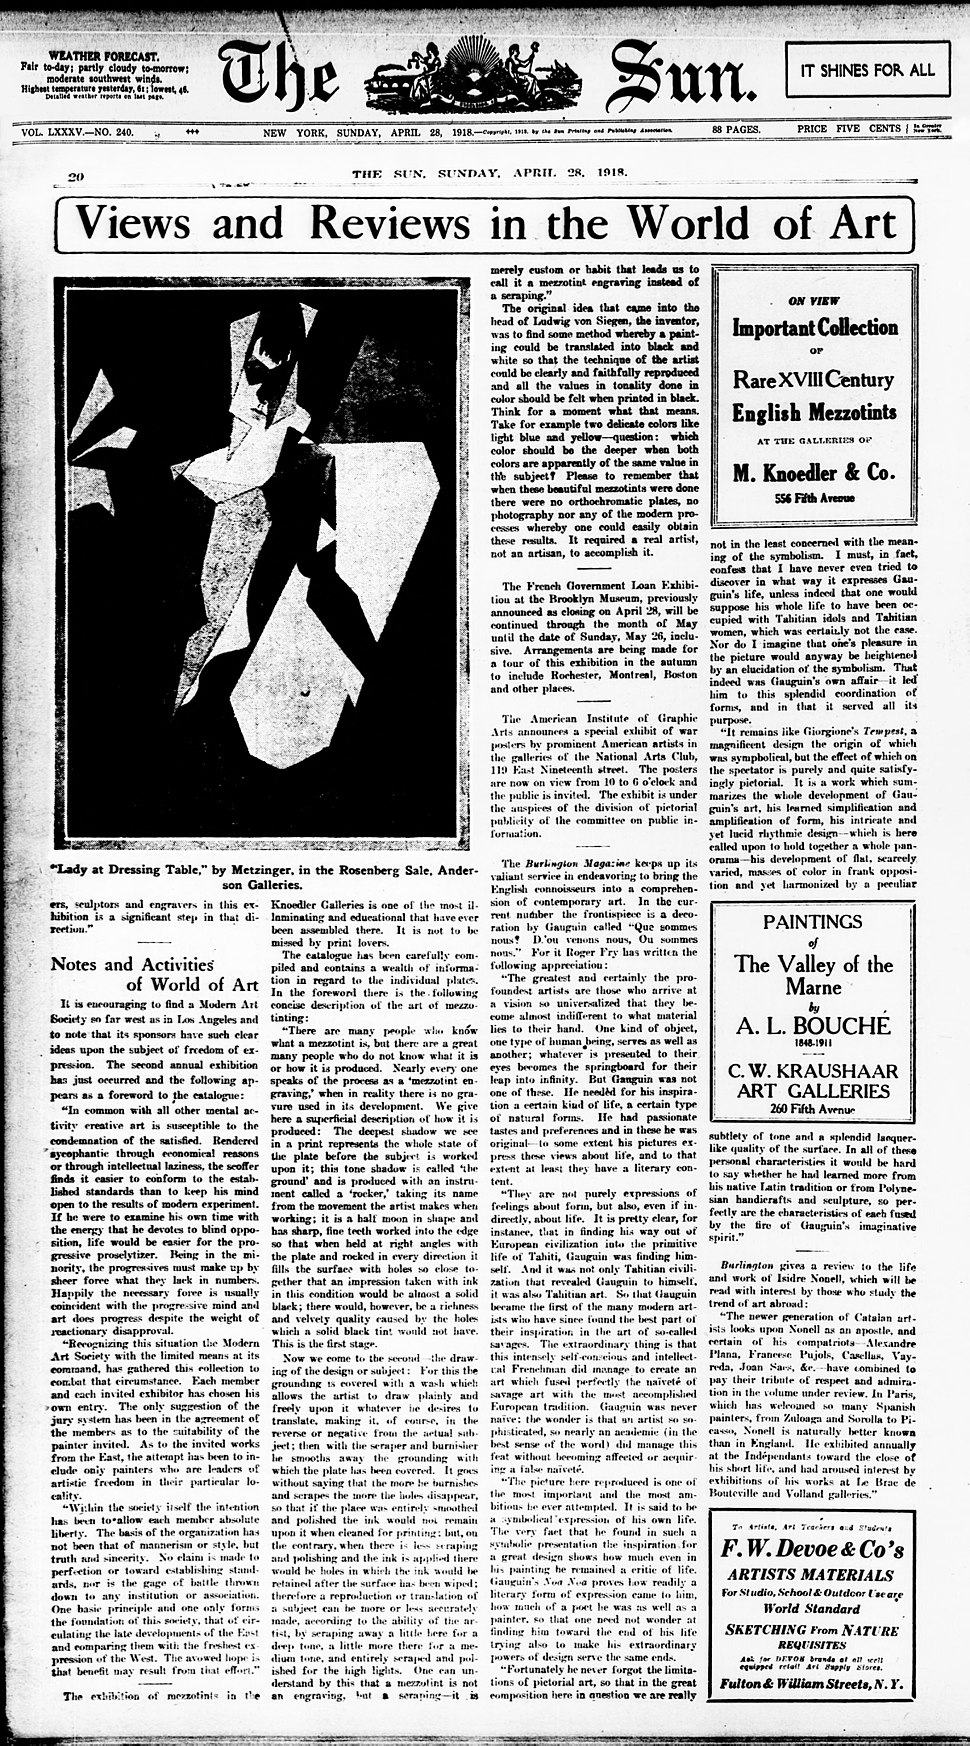 Jean Metzinger, 1916, Femme au miroir (Femme à sa toilette, Lady at her Dressing Table), published in The Sun, New York, 28 April 1918